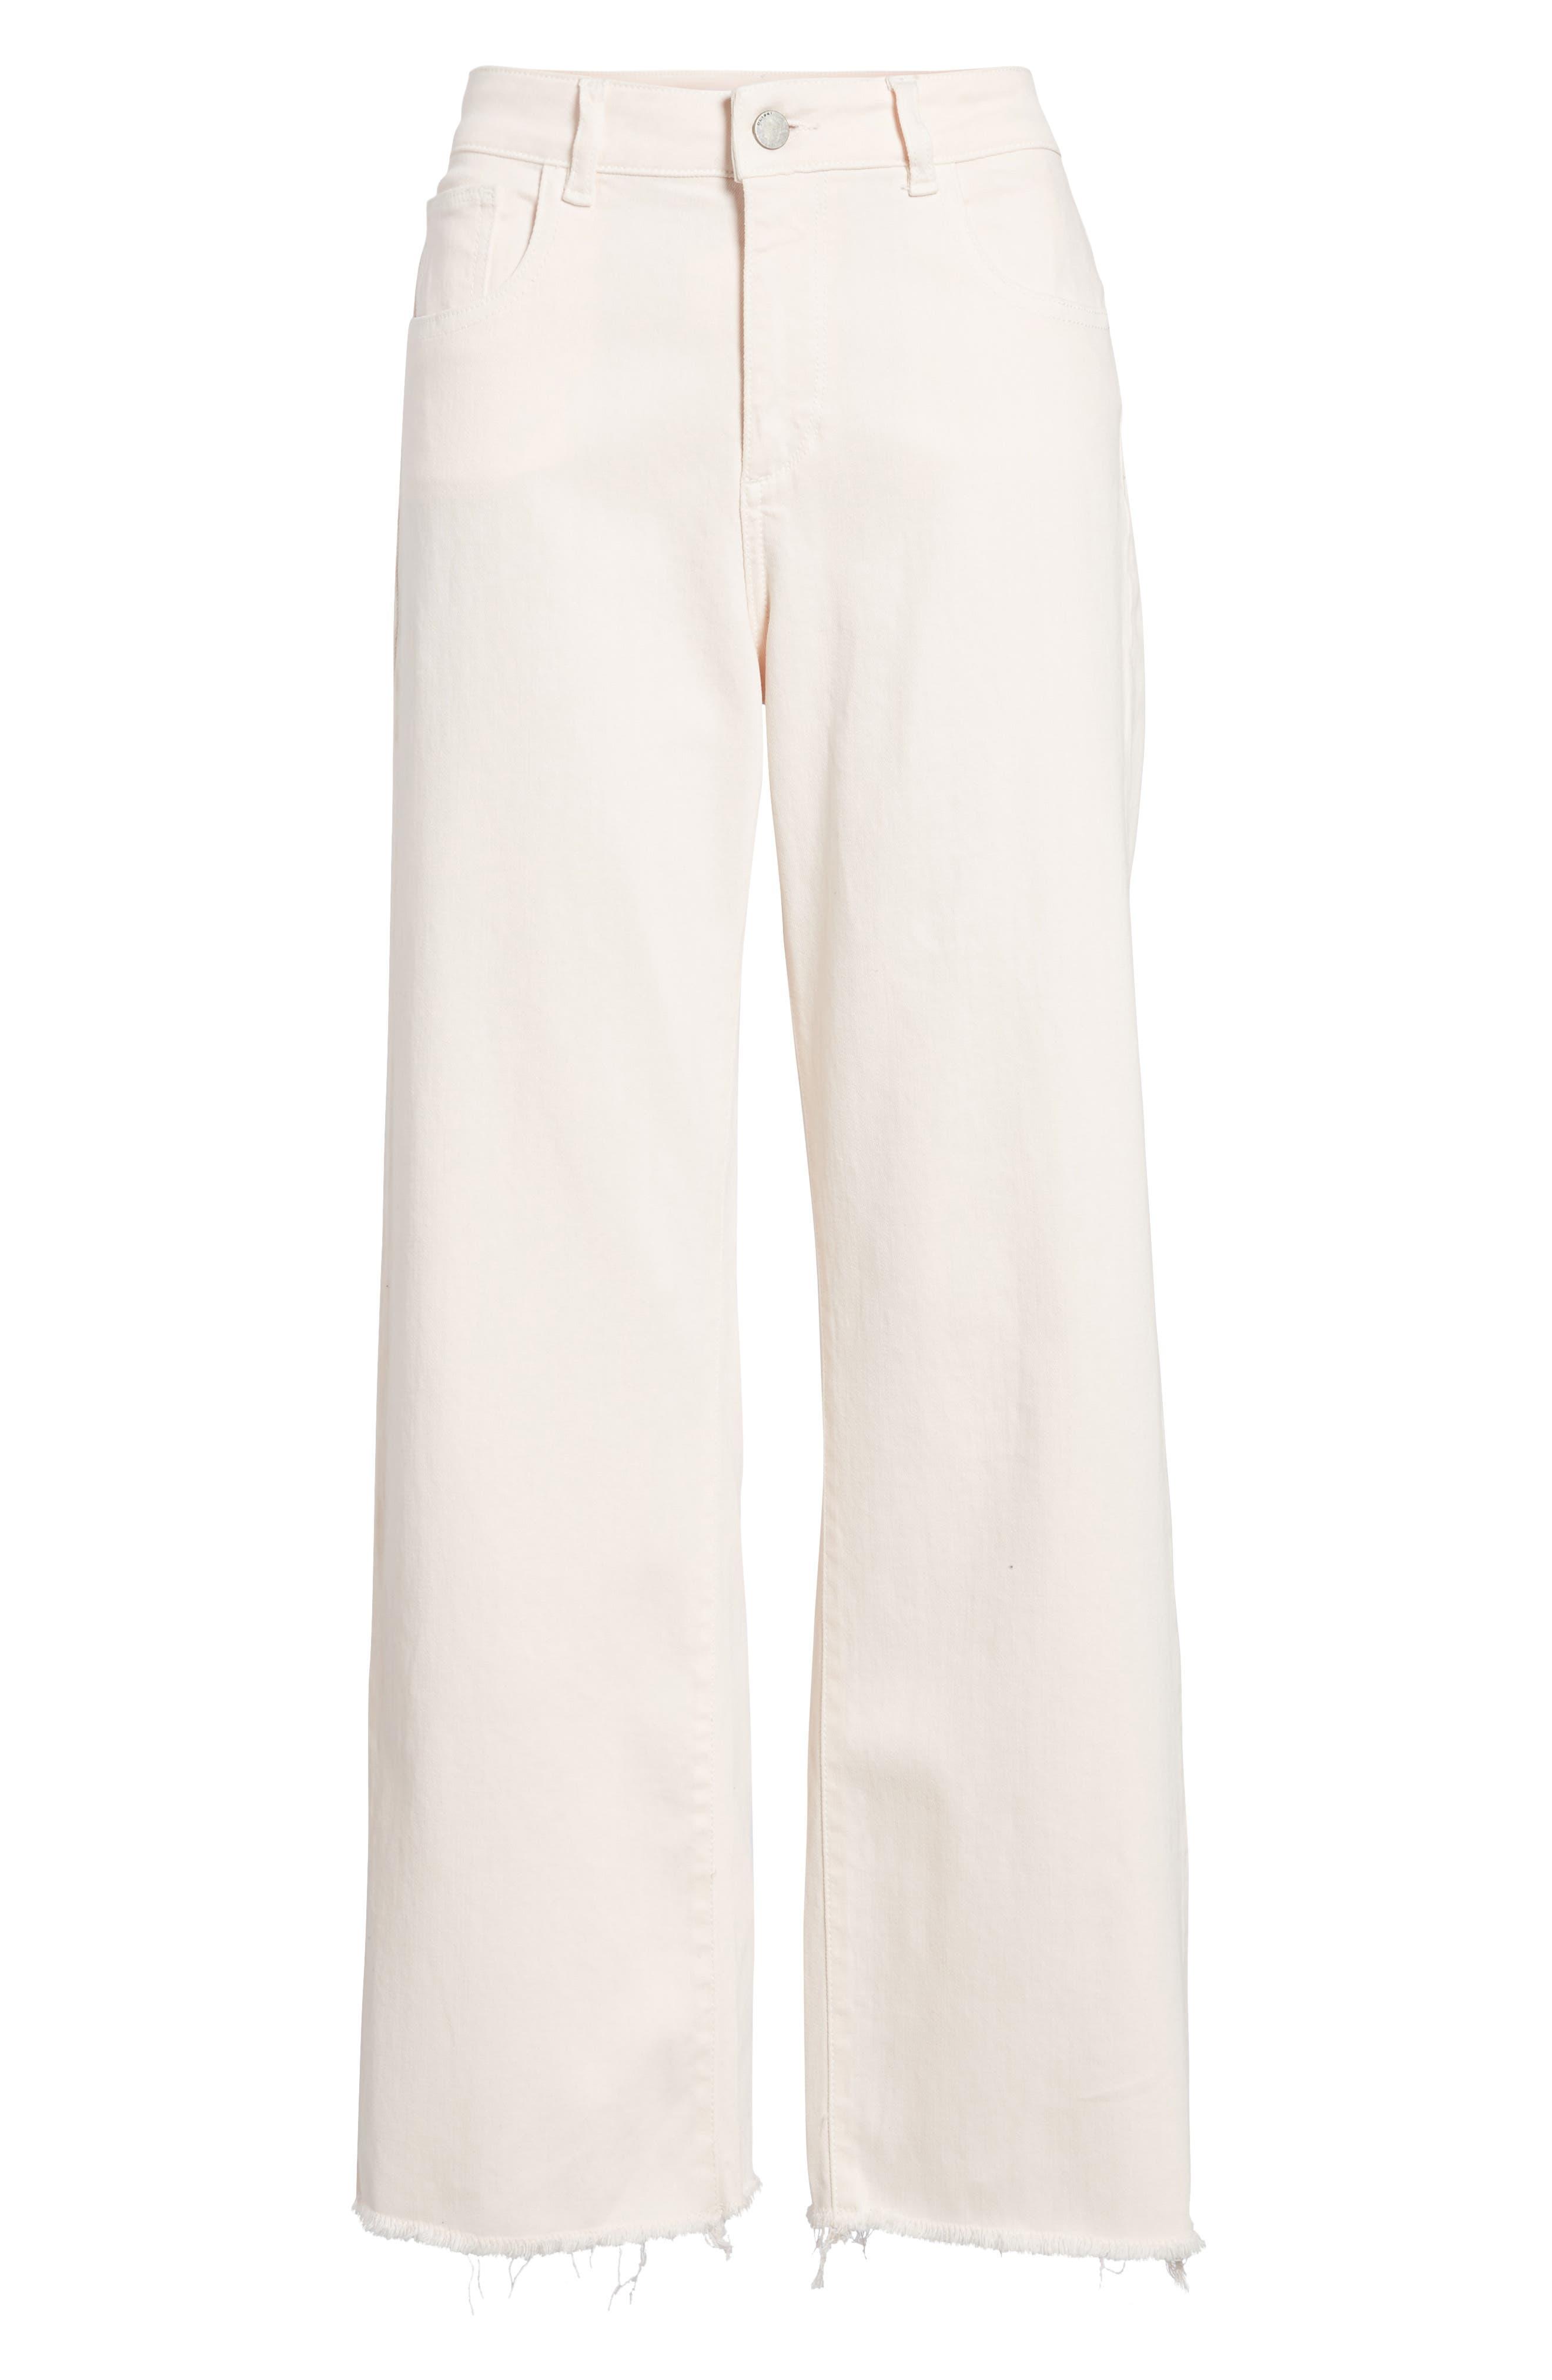 Hepburn Ankle Wide Leg Jeans,                             Alternate thumbnail 6, color,                             Blush Pink